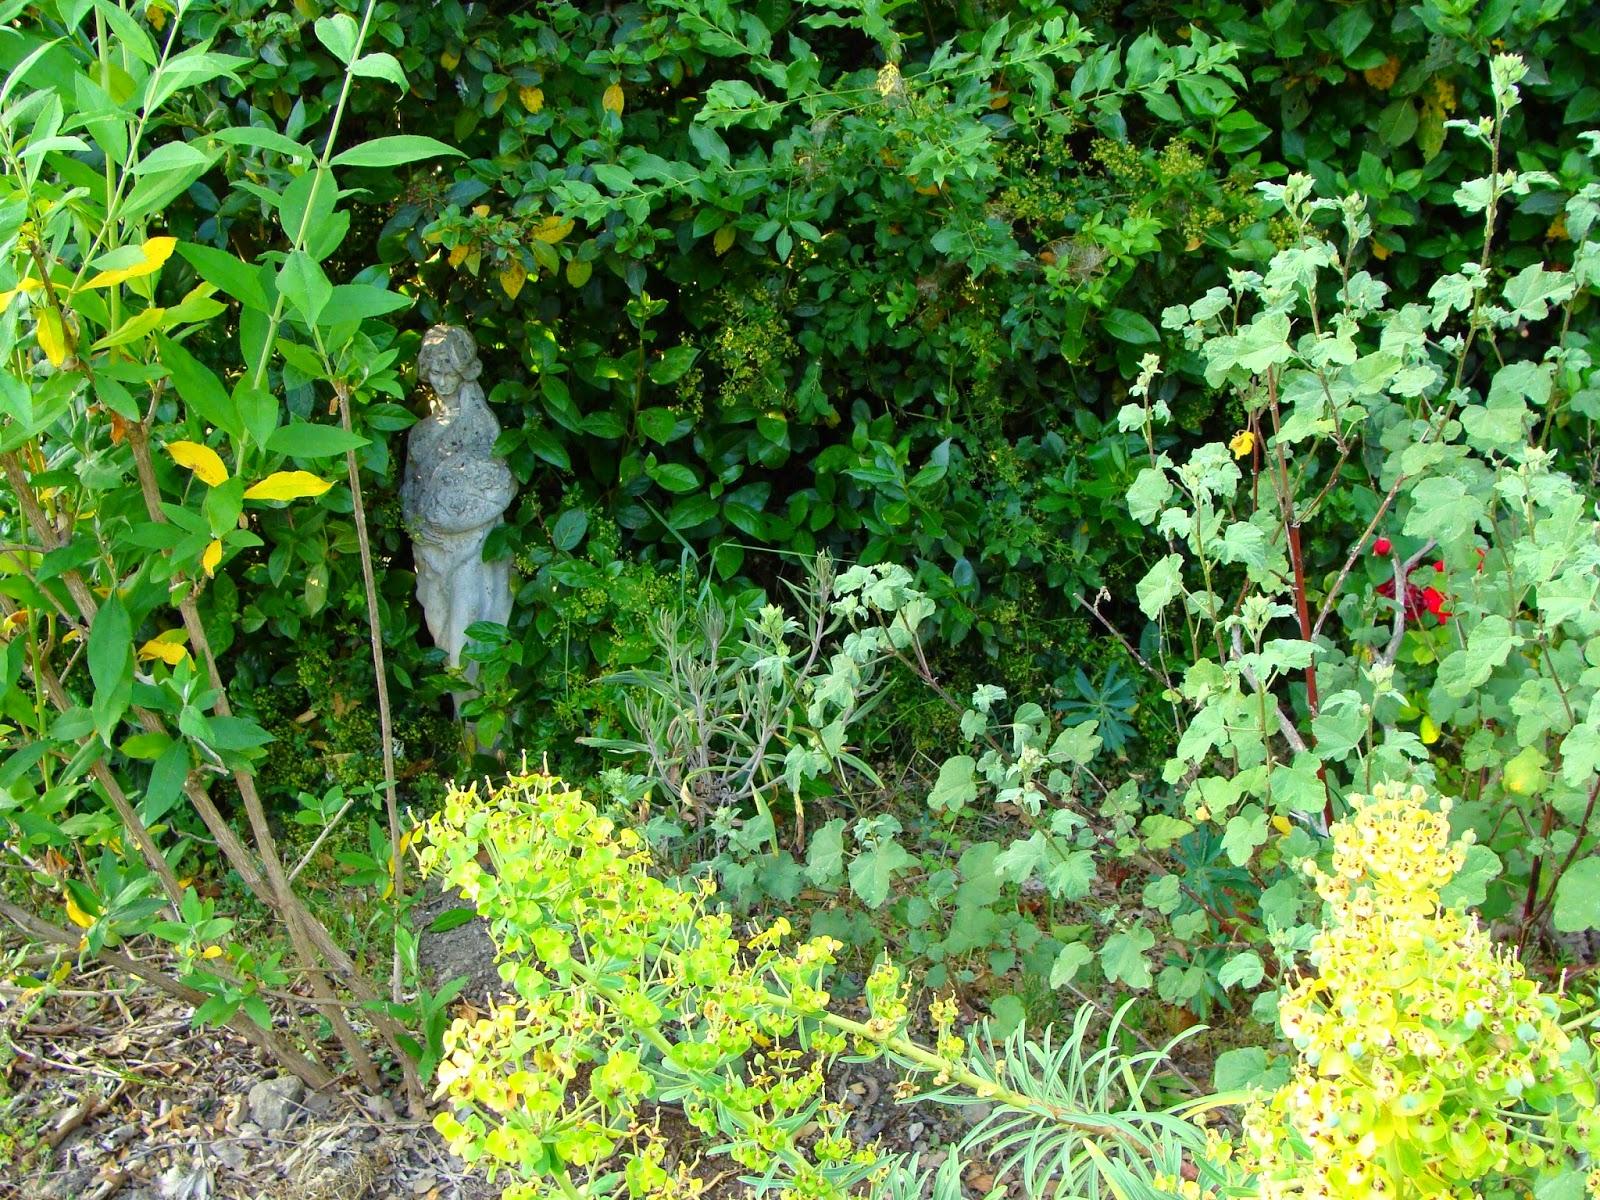 Jardine et ris c est la cata for Jardin jardine